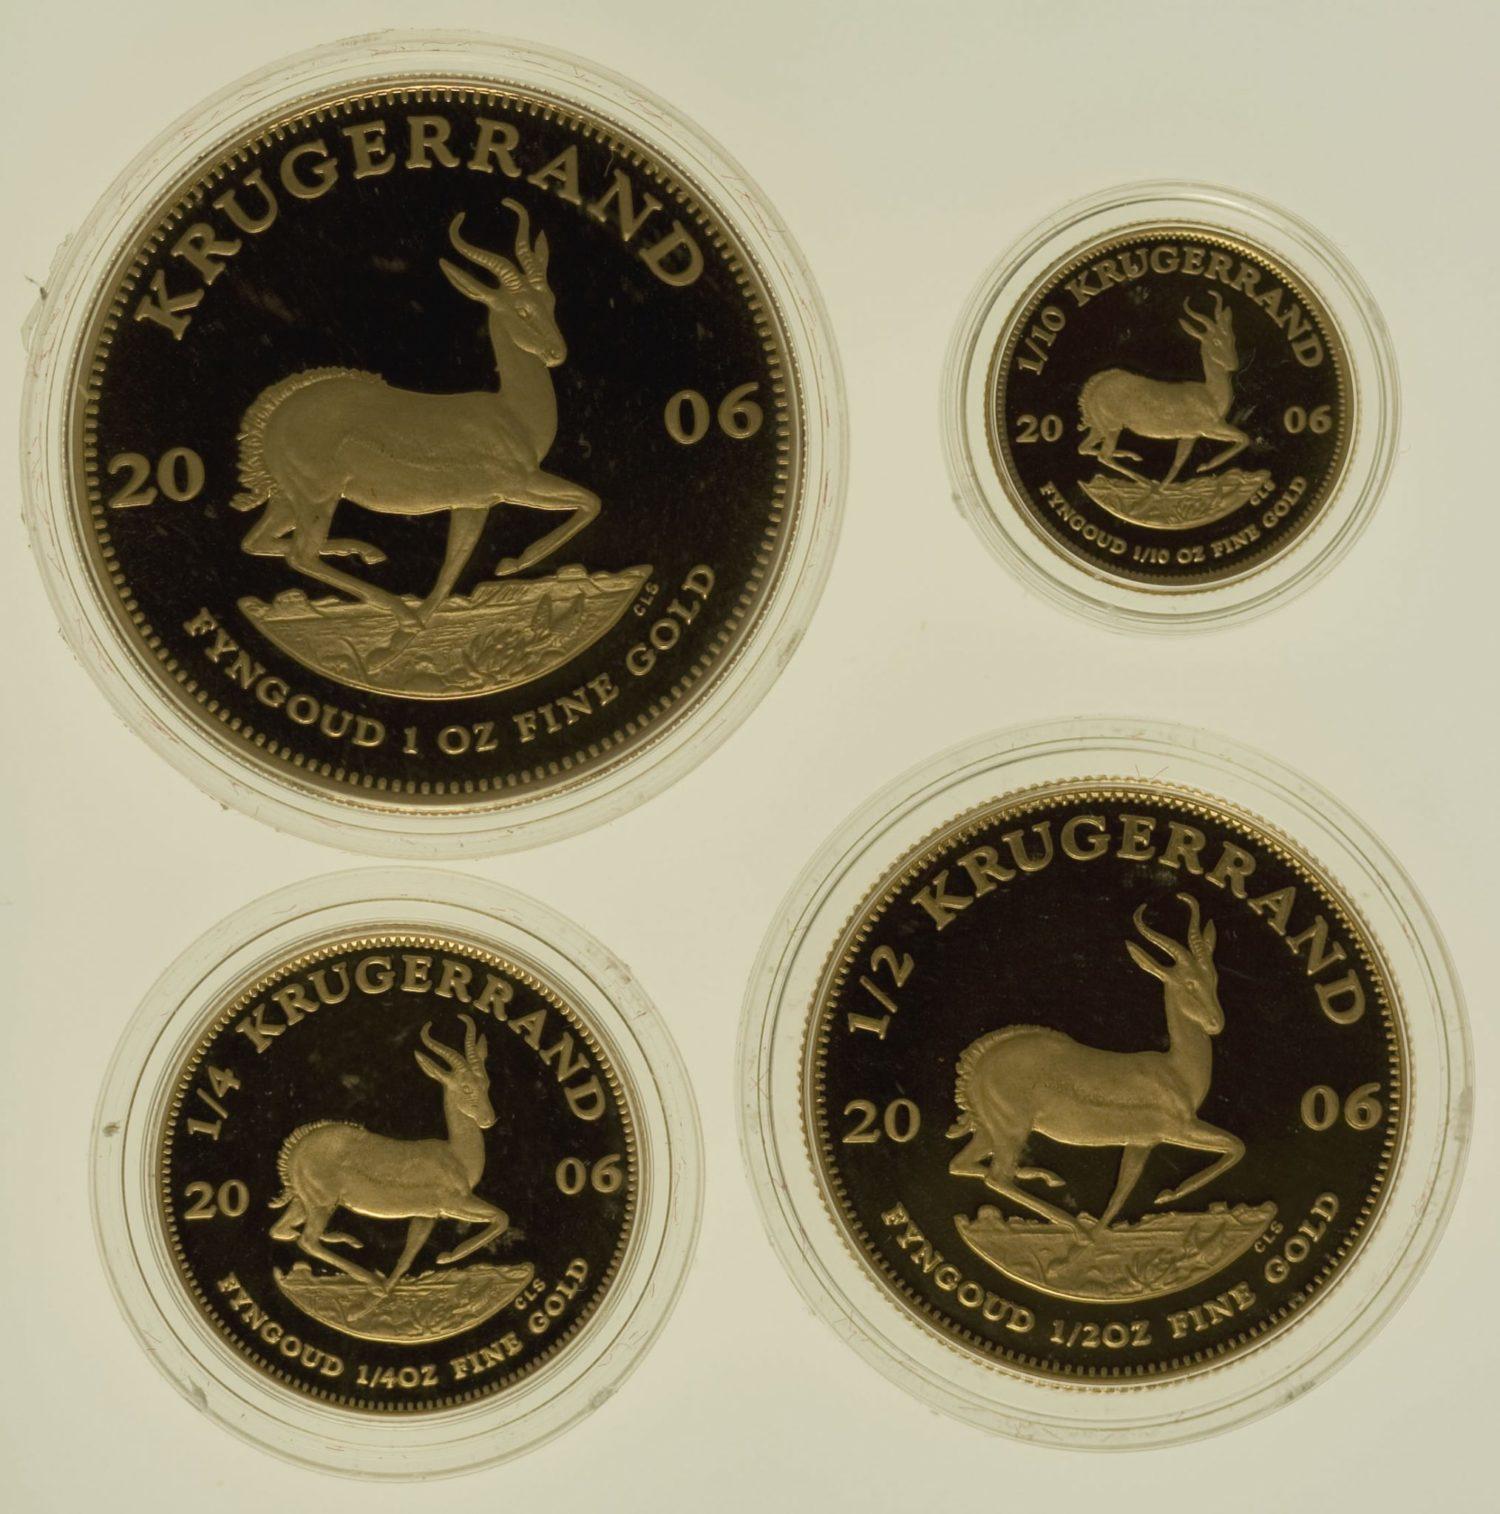 suedafrika - Südafrika Krügerrand 4 Coin Proof Set 2006